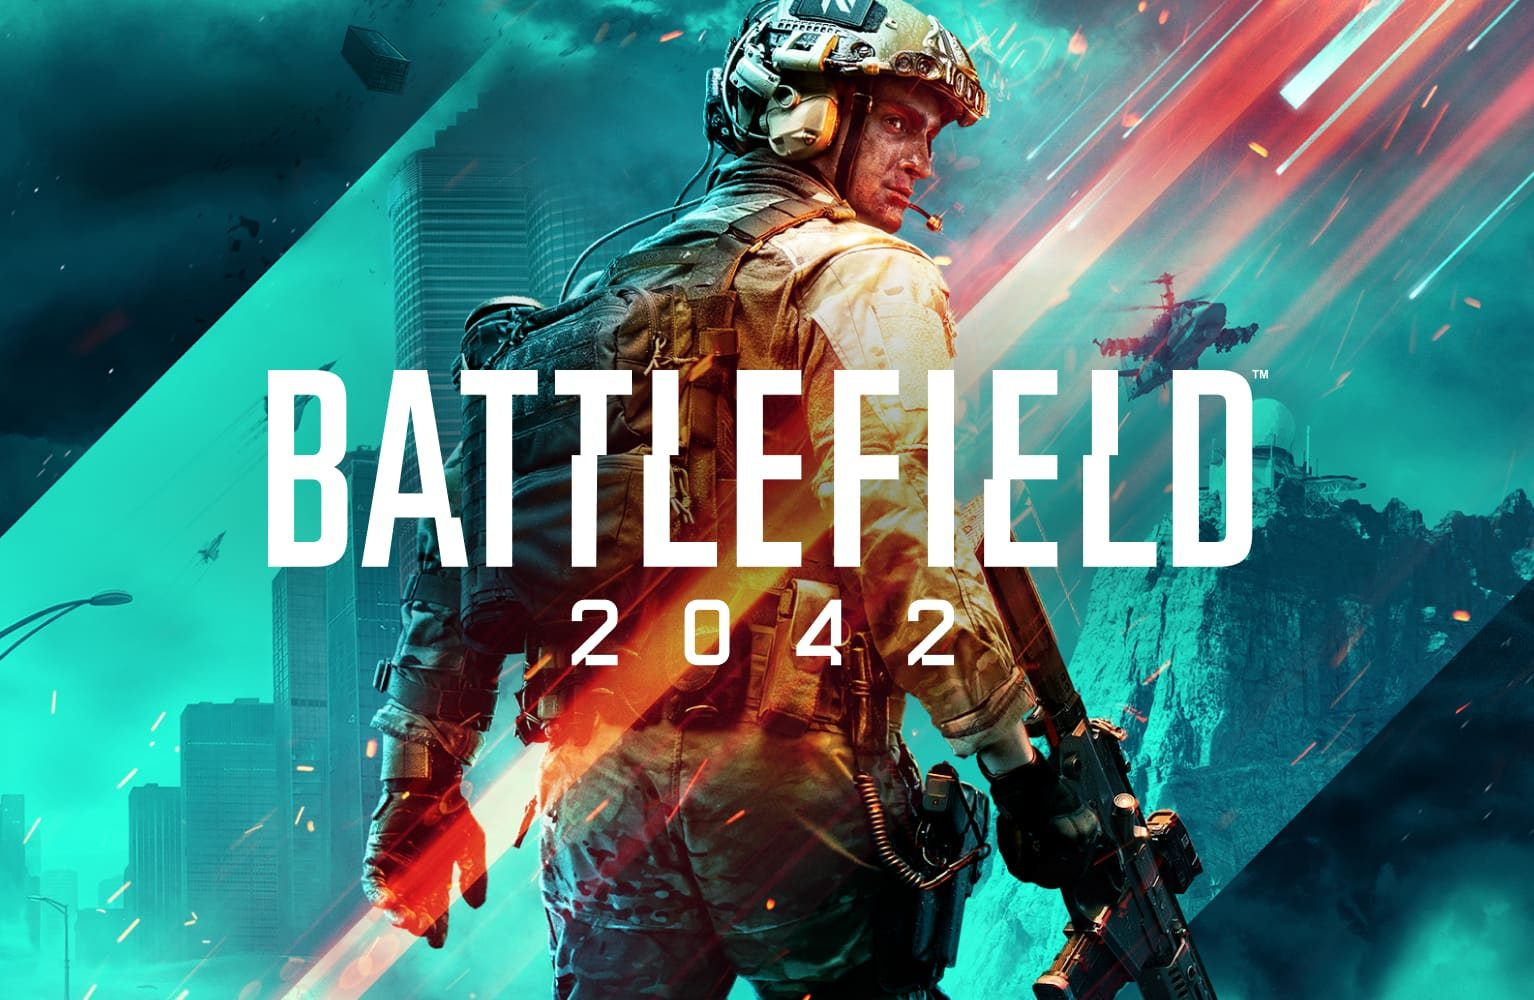 https://media.contentapi.ea.com/content/dam/battlefield/battlefield-2042/homepage/common/bf-2042-section-bg-homepage-hero-keyart-xl.jpg.adapt.320w.jpg